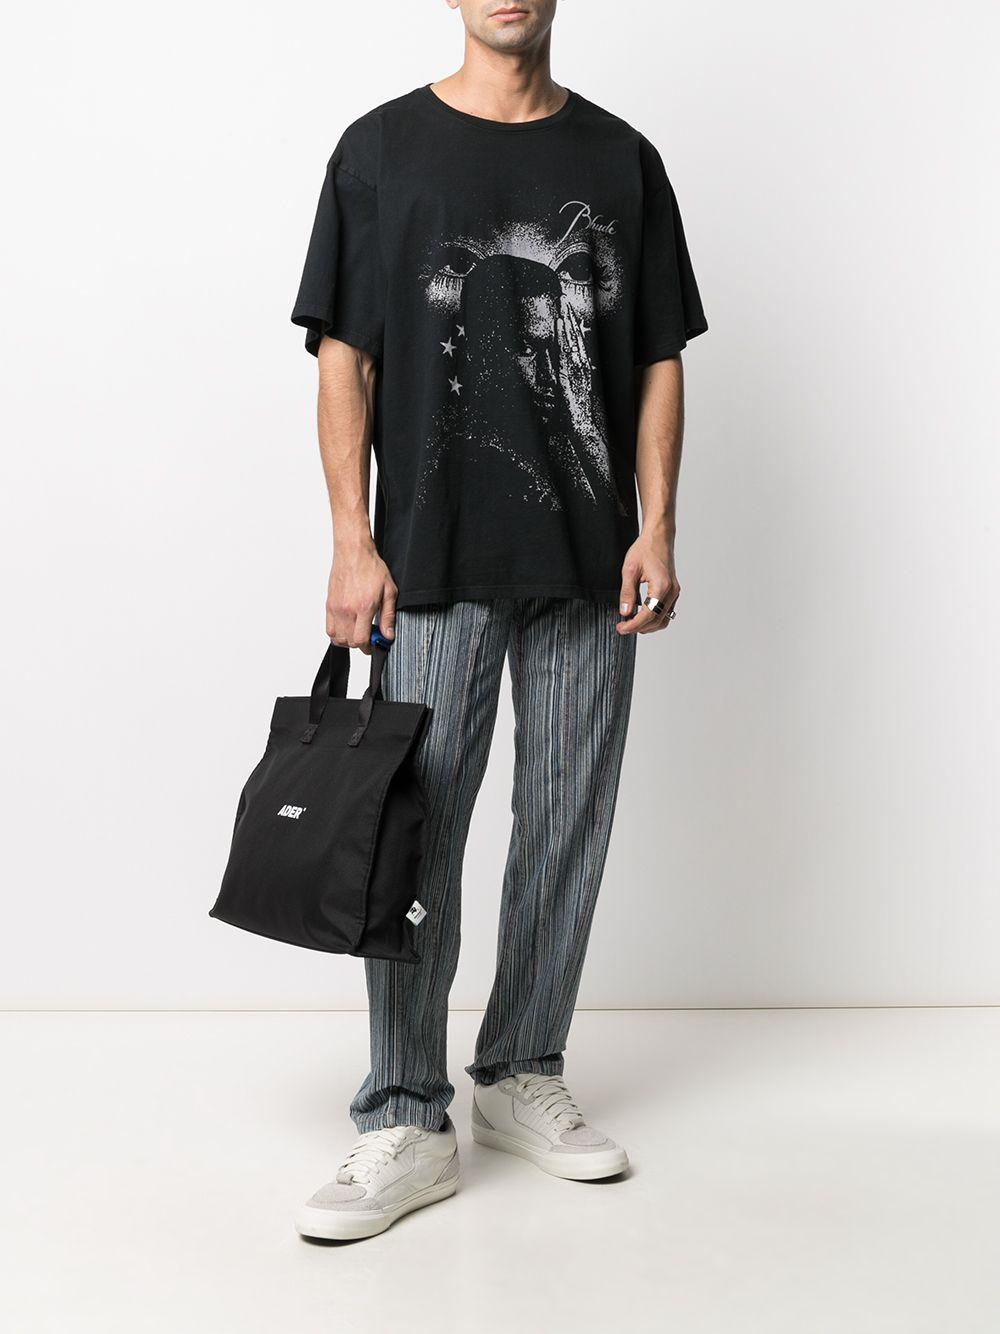 Rhude print t-shirt man black RHUDE | T-shirts | RHPS21TT30015